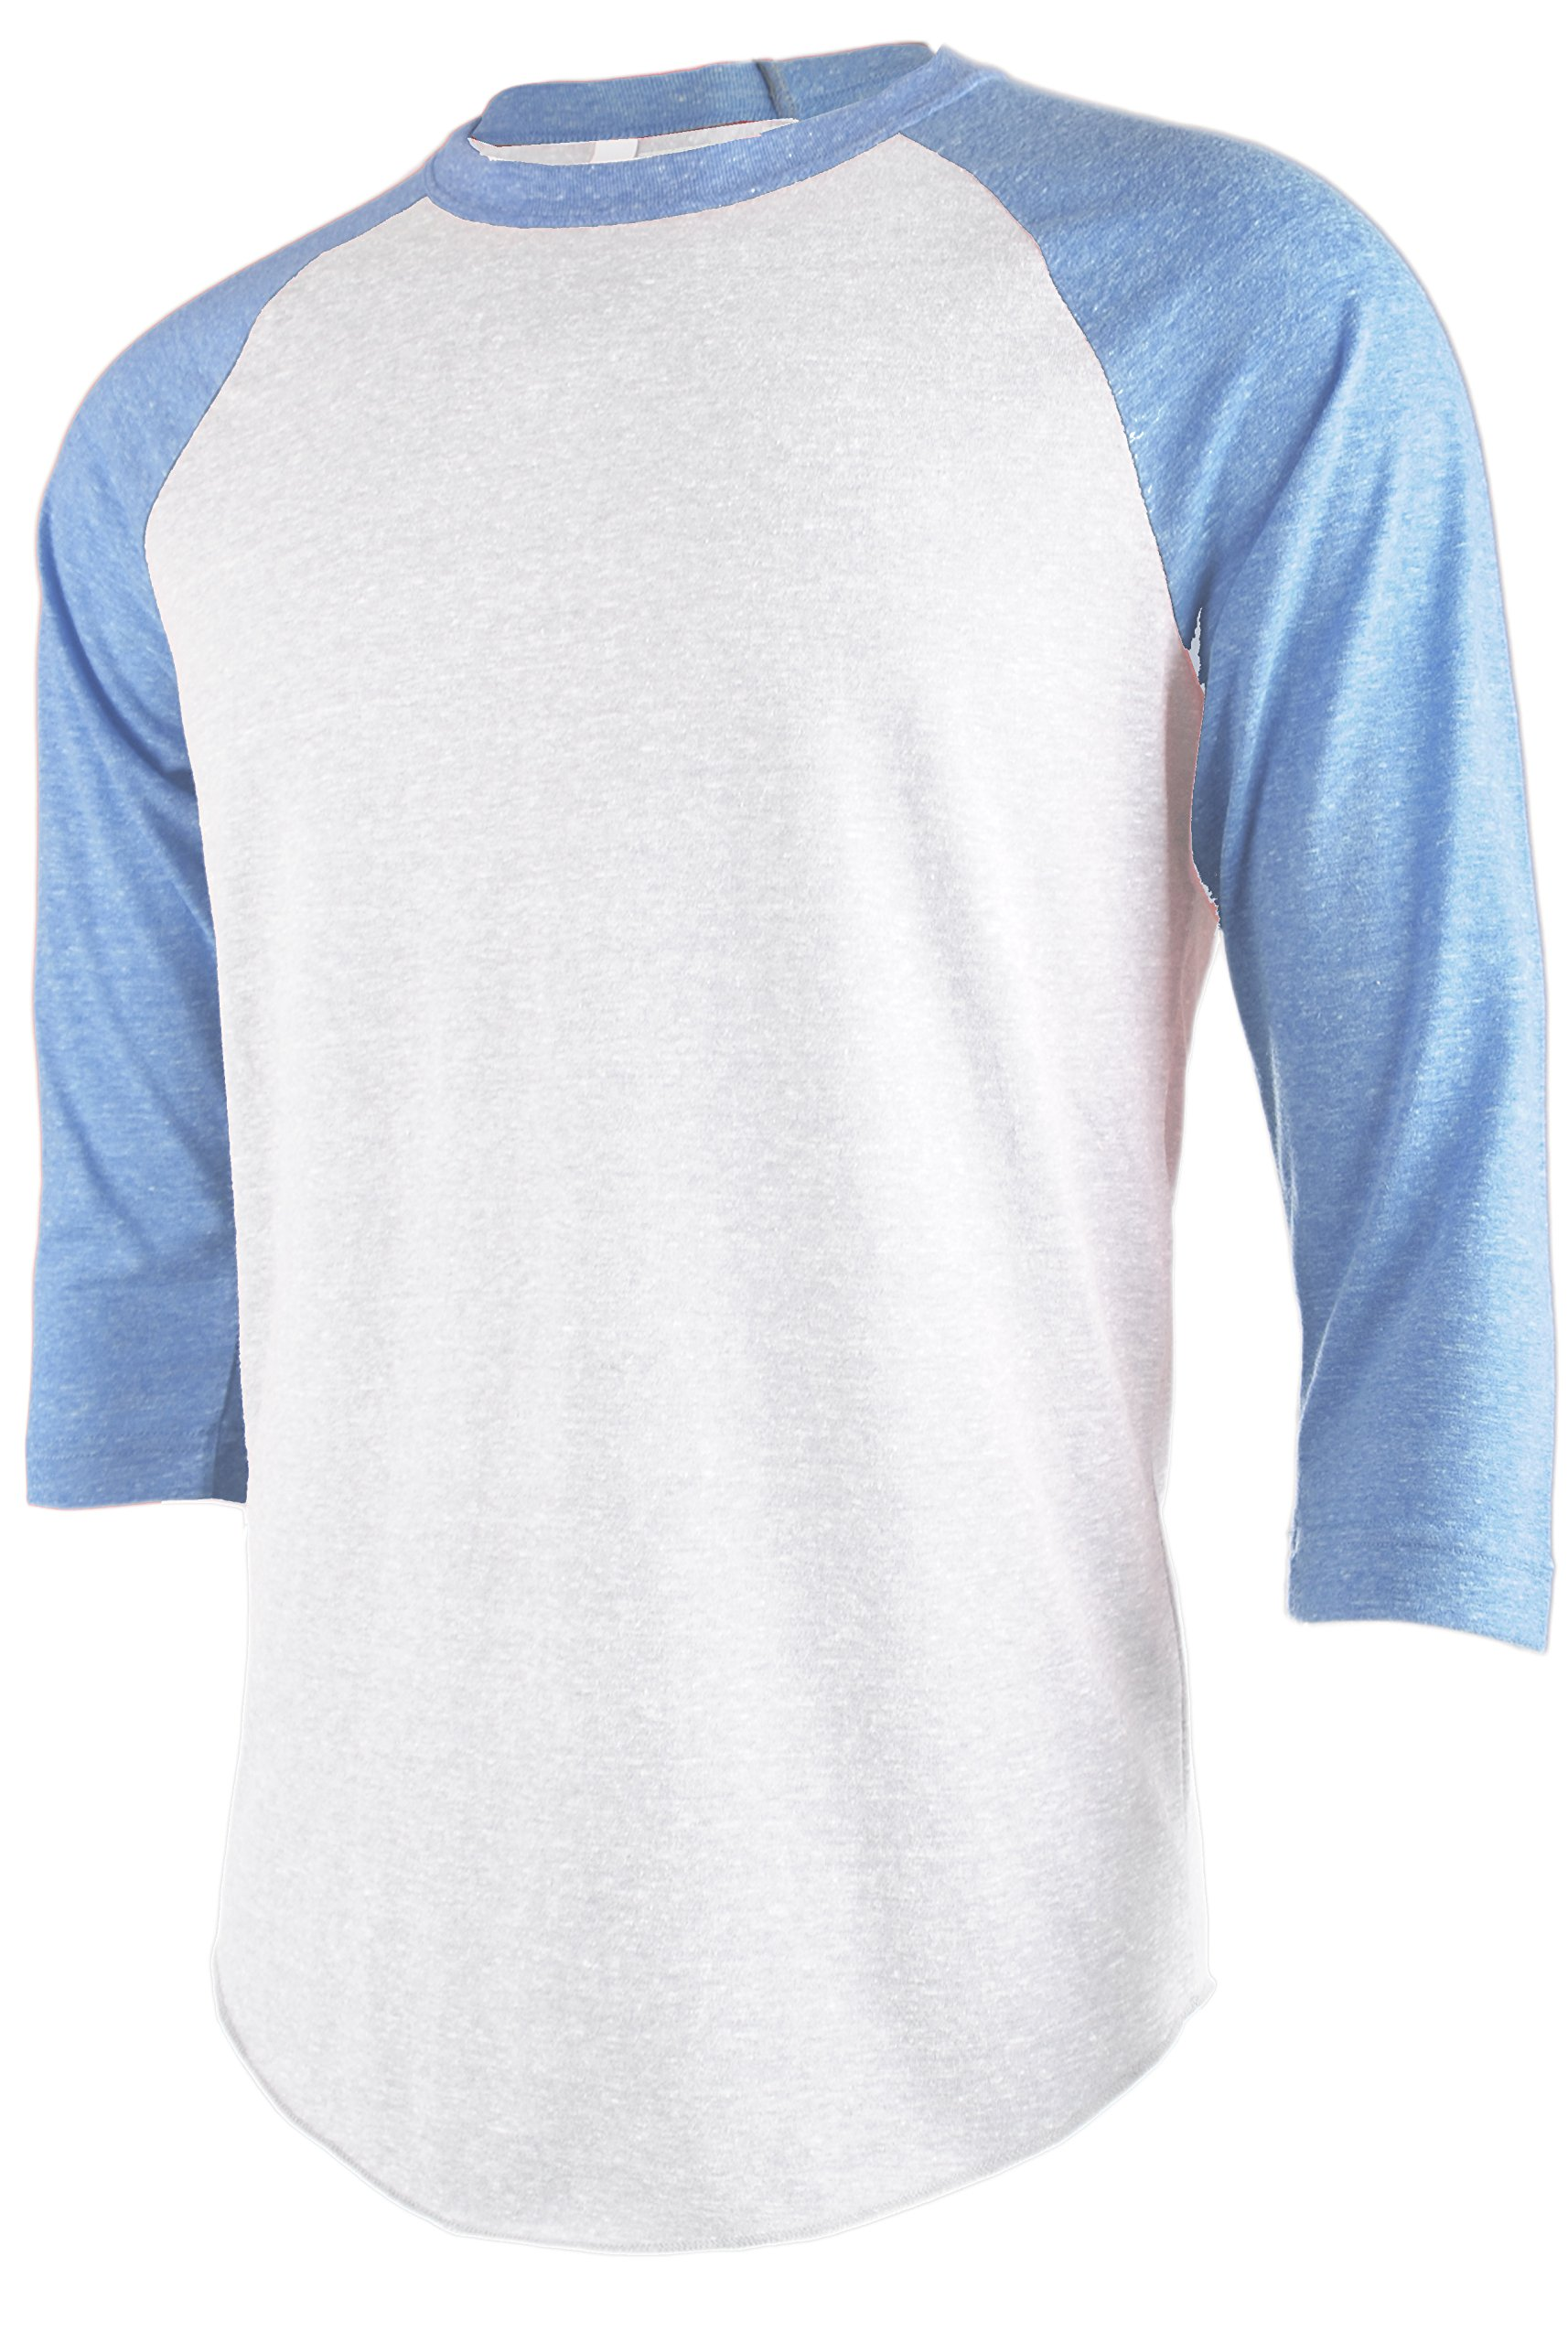 TL Men's Basic 3/4 Sleeve Baseball Top Fitted Tri-blend Raglan T-Shirt WHITE_BLUE L